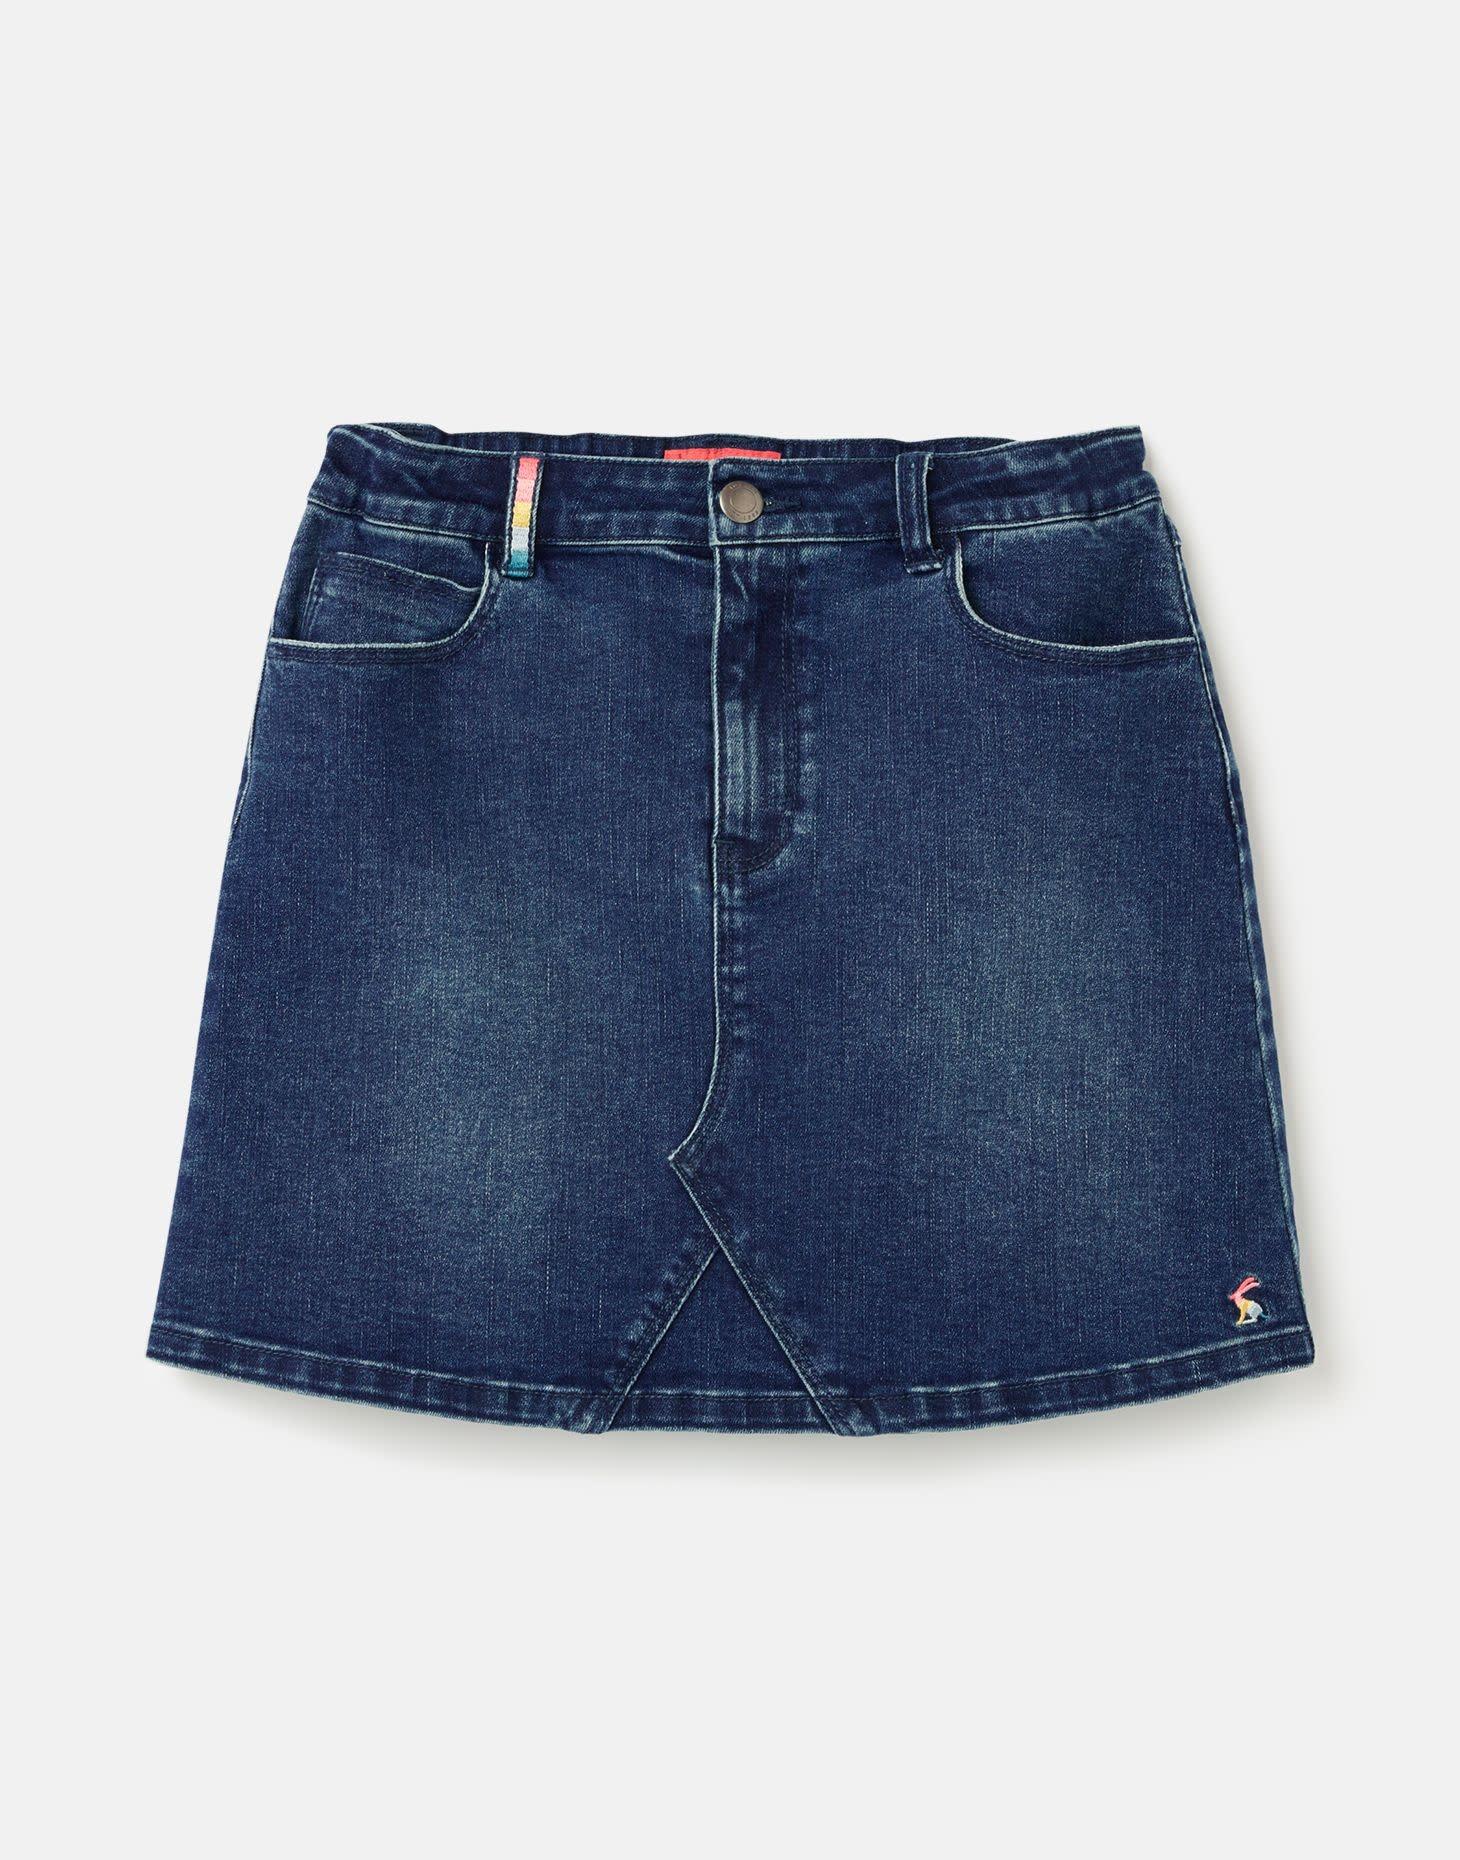 Joules Hollis 5 Pocket Denim Skirt